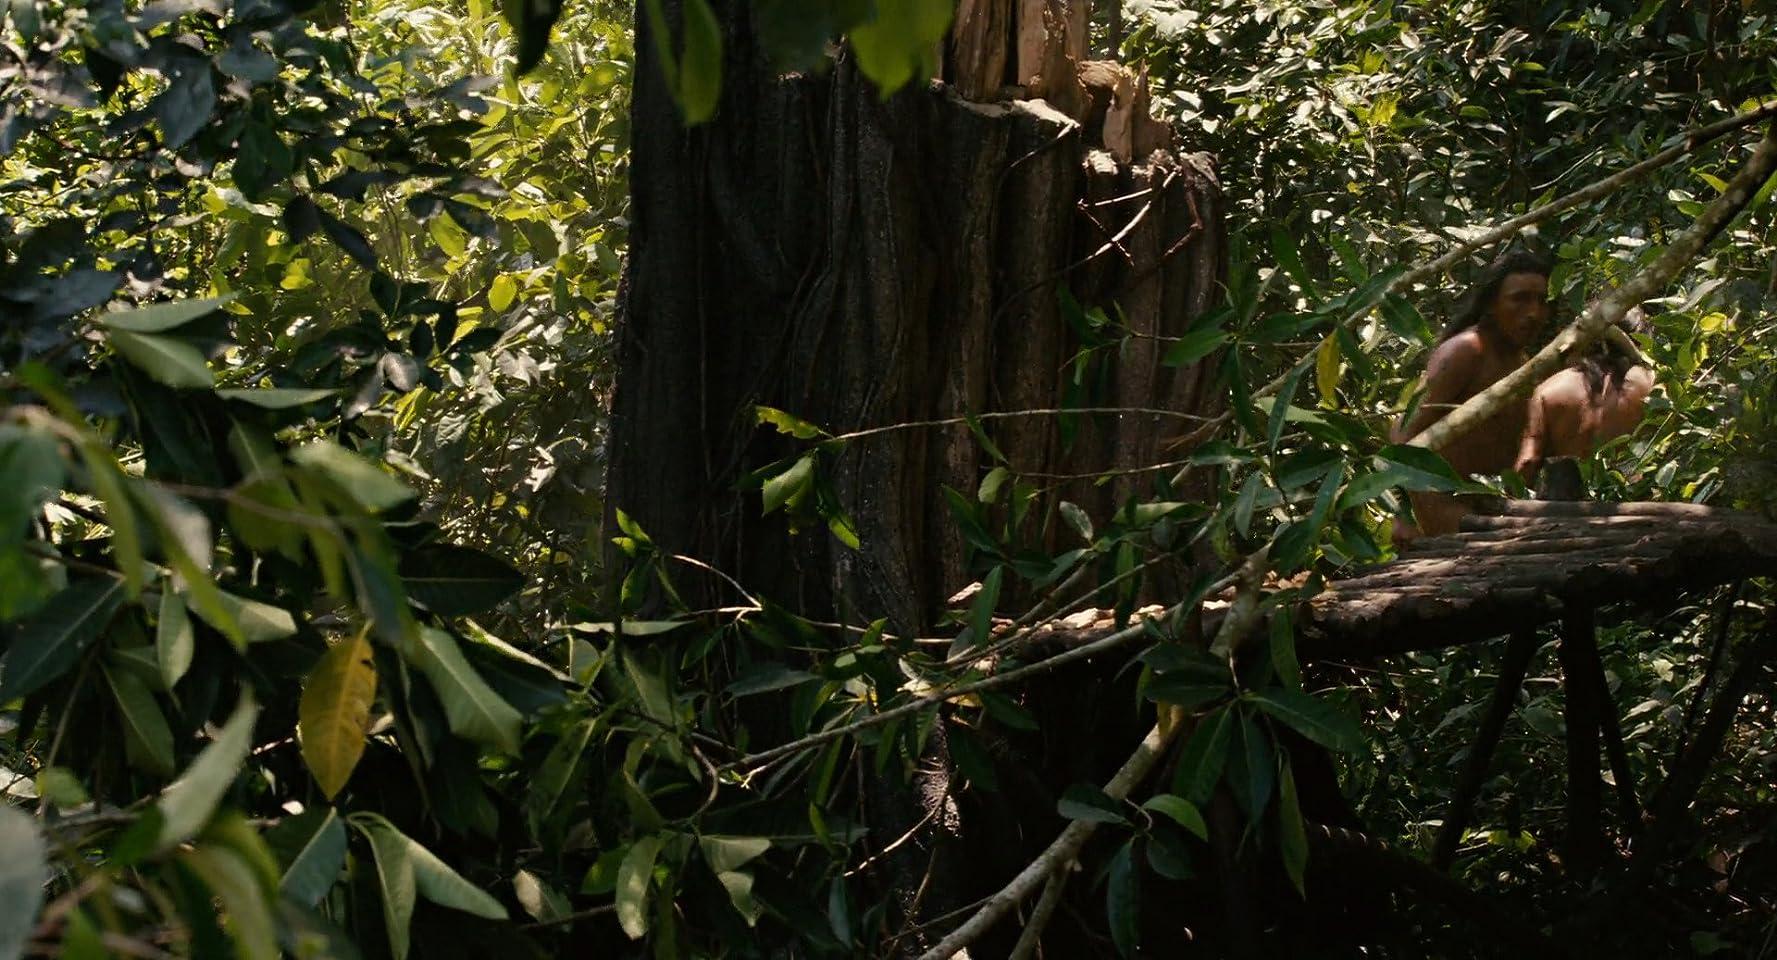 Apocalypto-Yucatan-jungle-jungle-Mayan